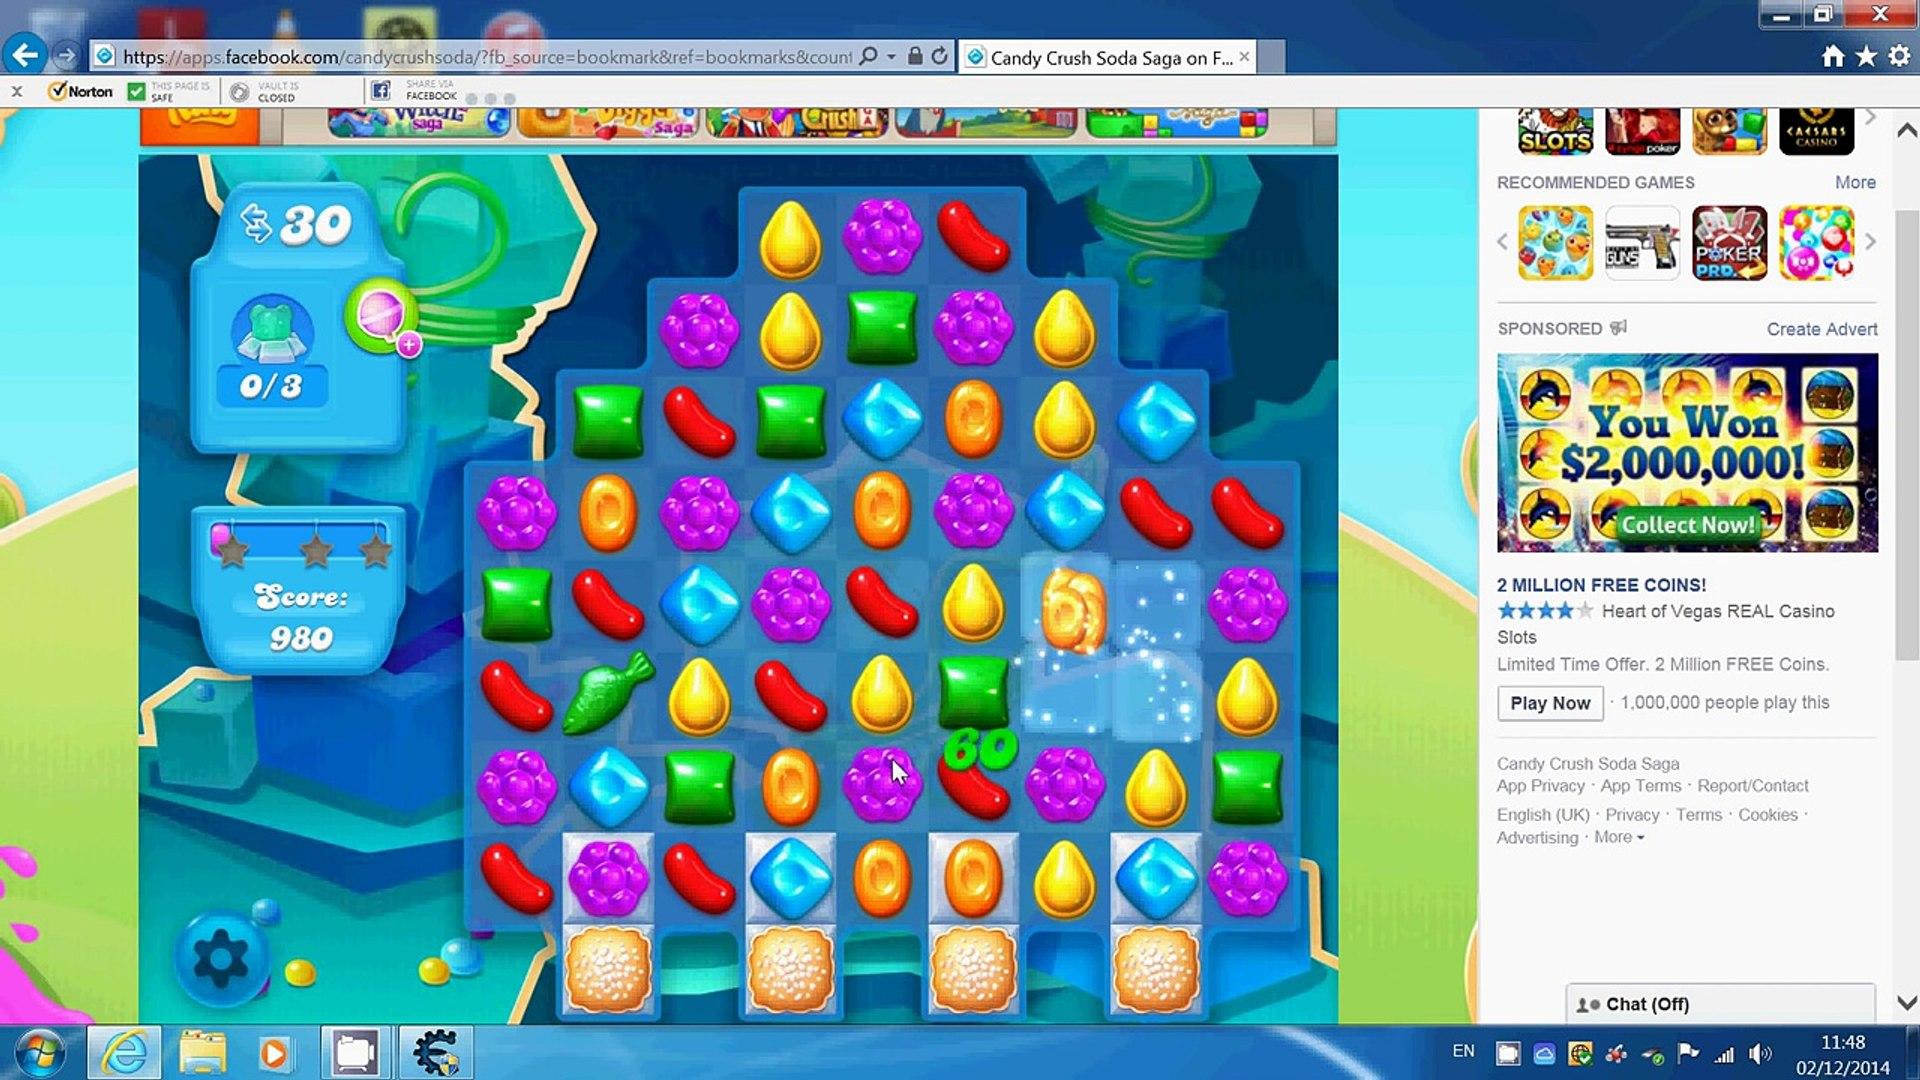 Candy Crush Soda Saga Cheat - Unlimited Moves - 100% FREE 100% GENUINE